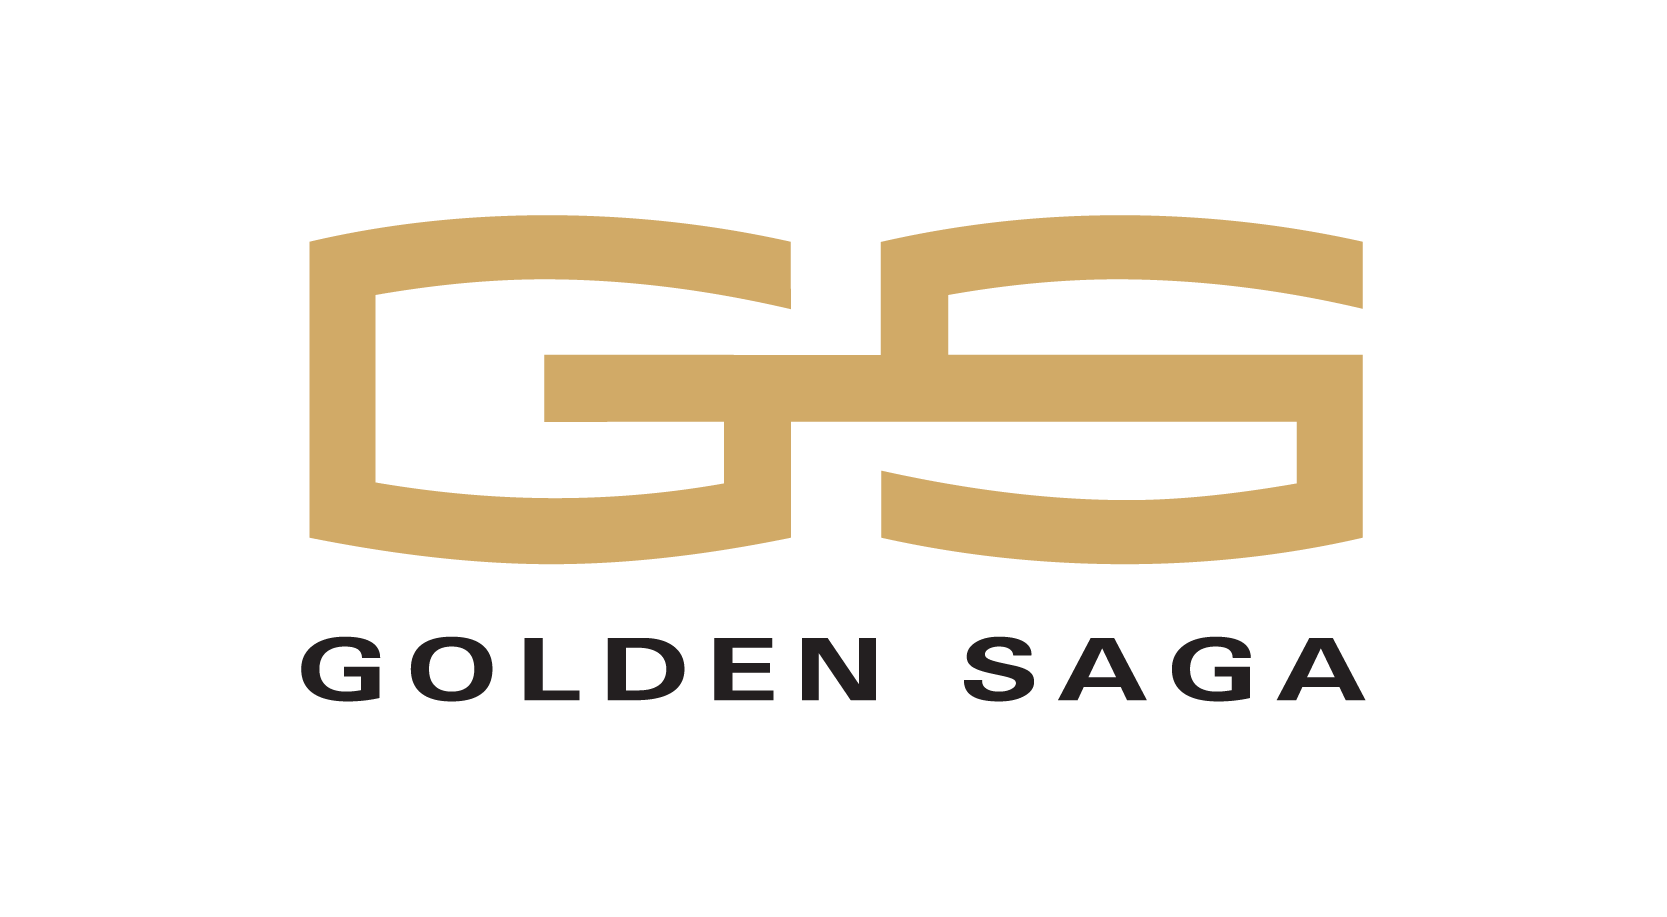 Golden Saga